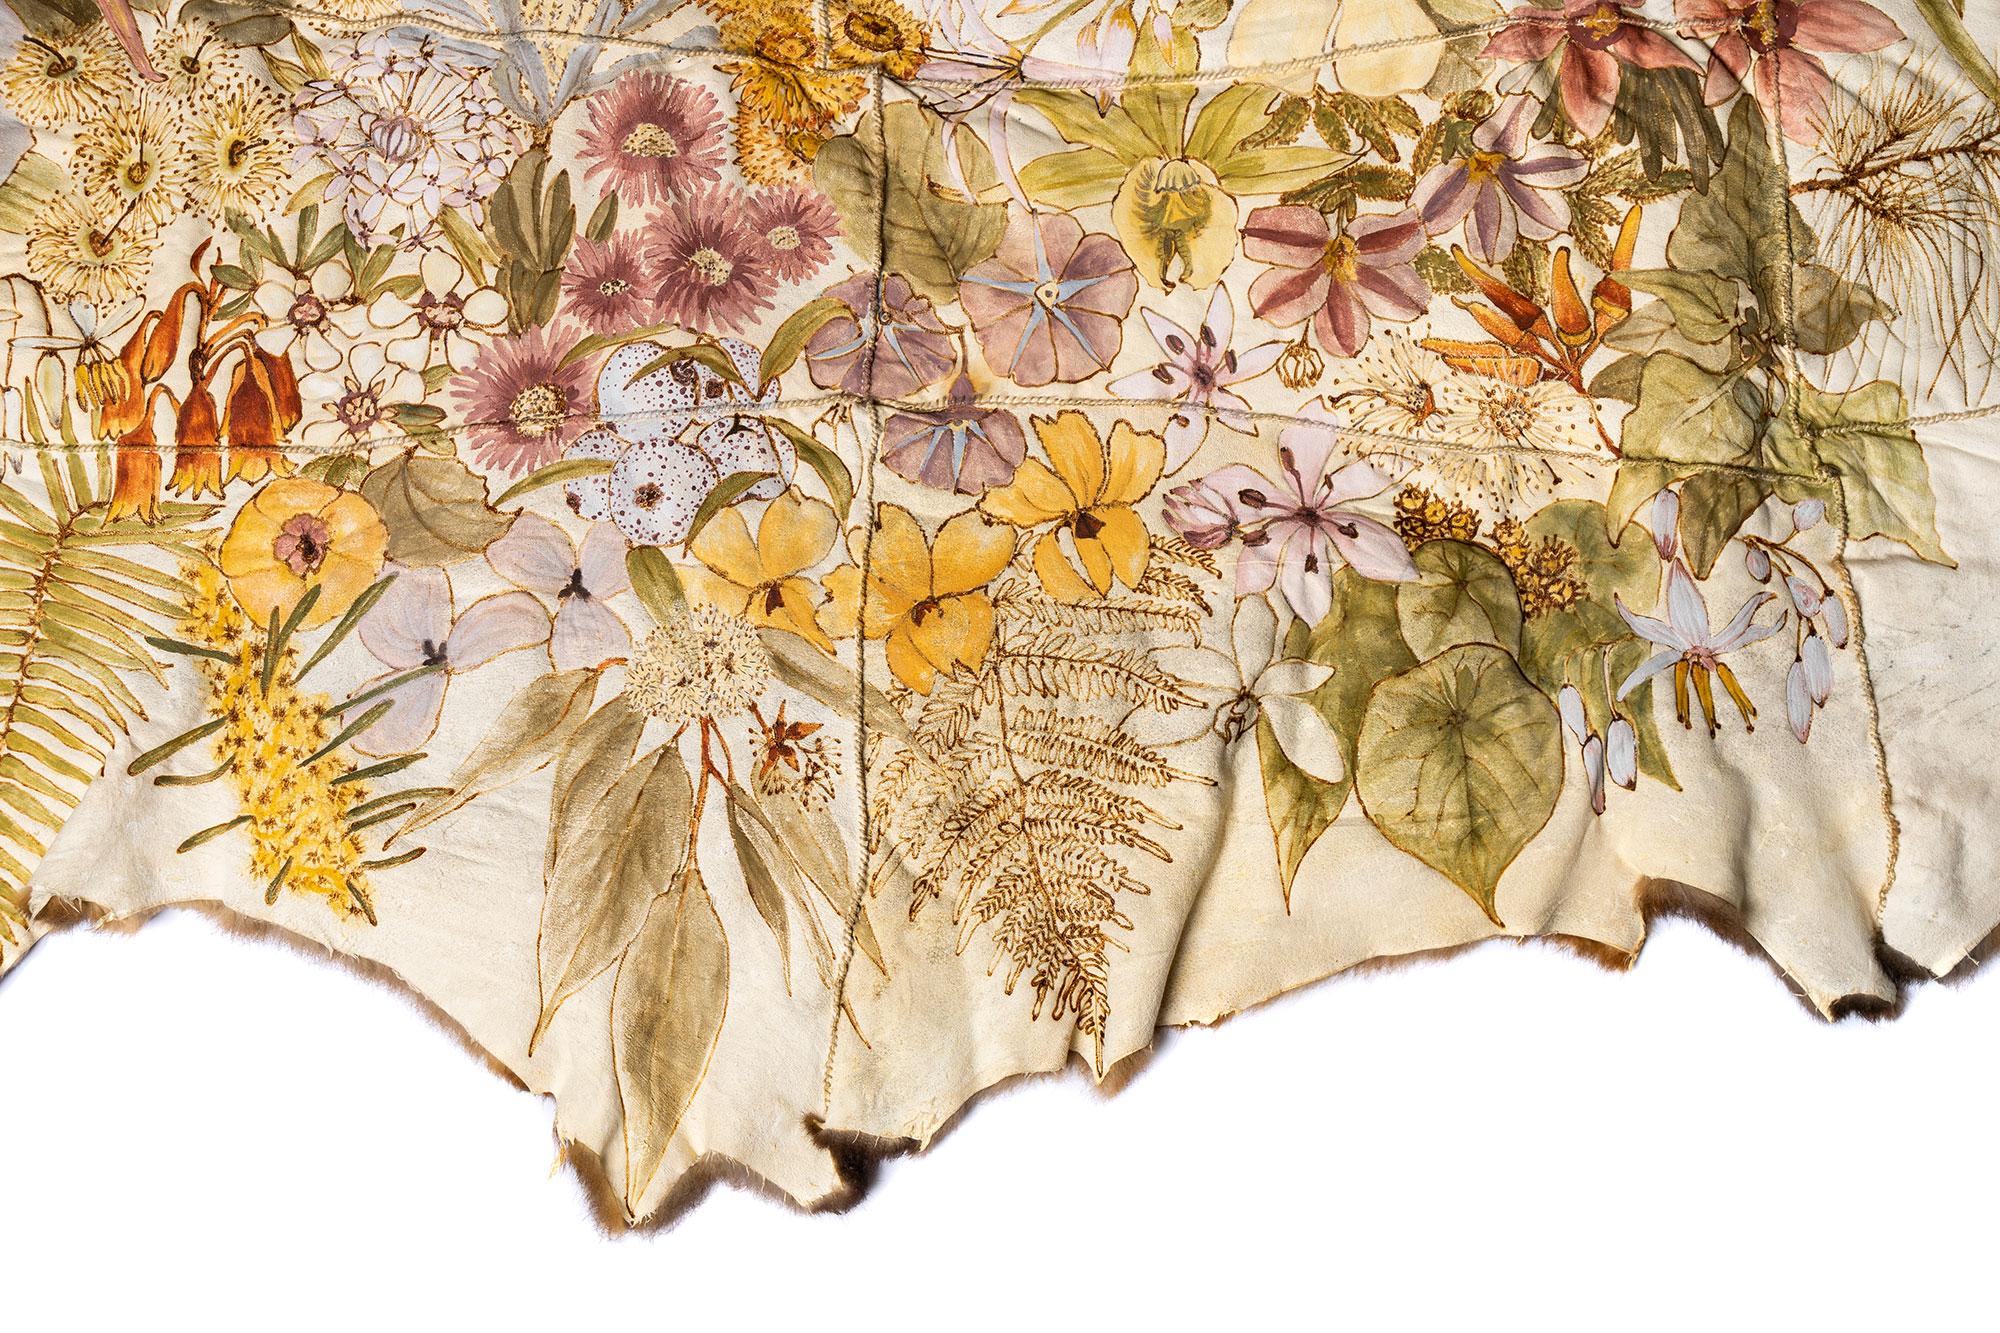 Carol MCGREGOR 'Wreath for Oodgeroo' (detail) 2020 | possum skins, charcoal, ochre, binder medium, waxed thread | Courtesy of the artist | Photo by Louis Lim